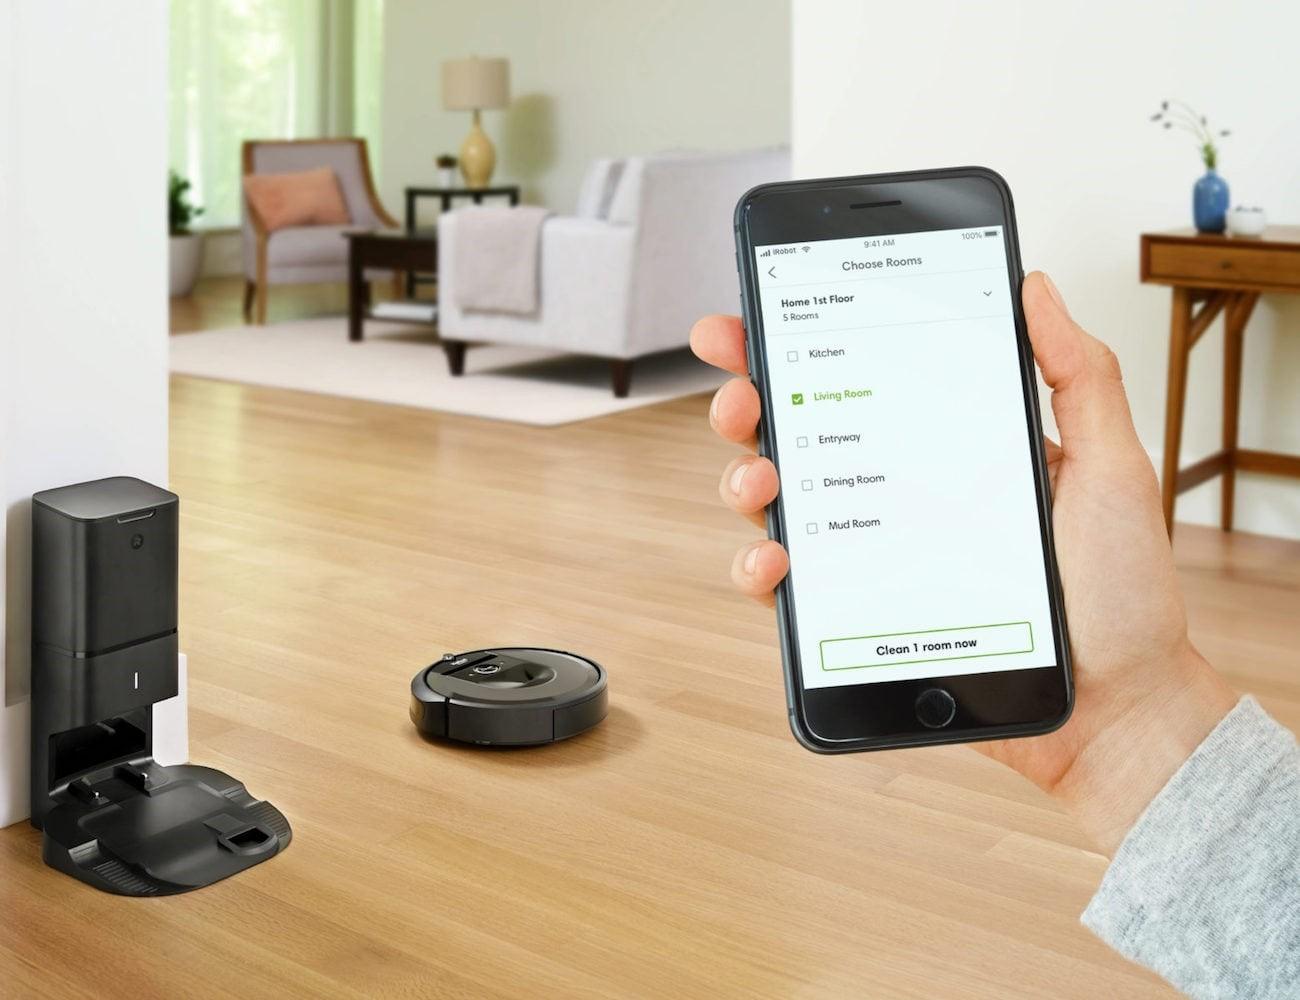 Roomba-self emptying vacuum cleaner